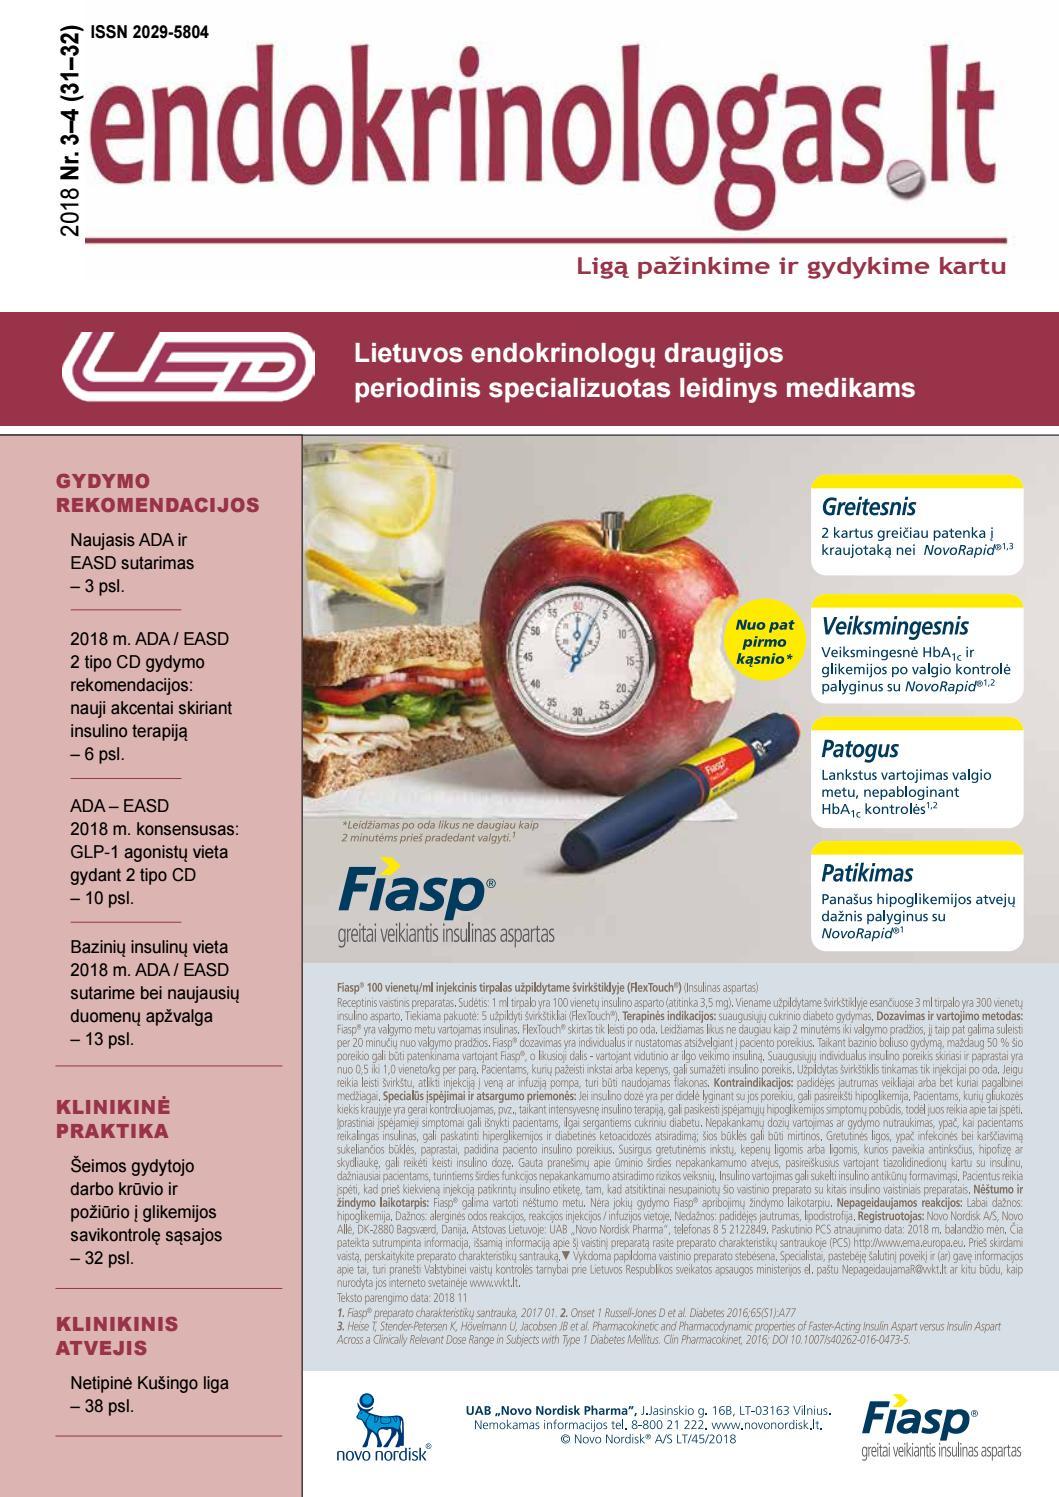 hipertenzijos etiopatogenezė)